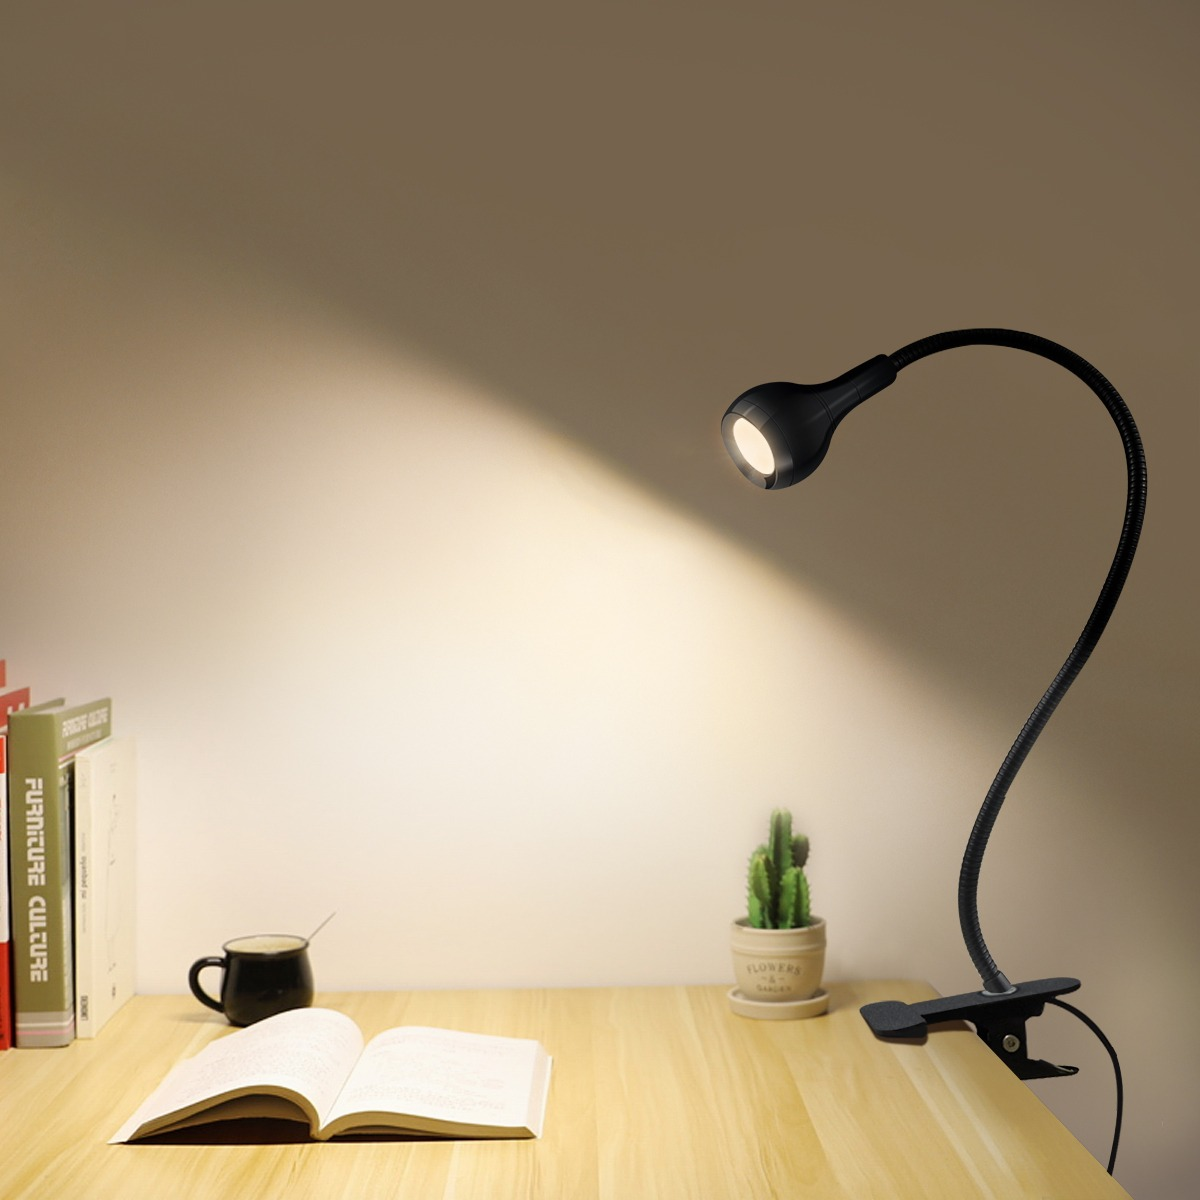 Licht & Beleuchtung Led Schreibtisch Lampe Mit Clip 1 W Flexible Led Lesen Lampe Usb Netzteil Led Buch Lampe.